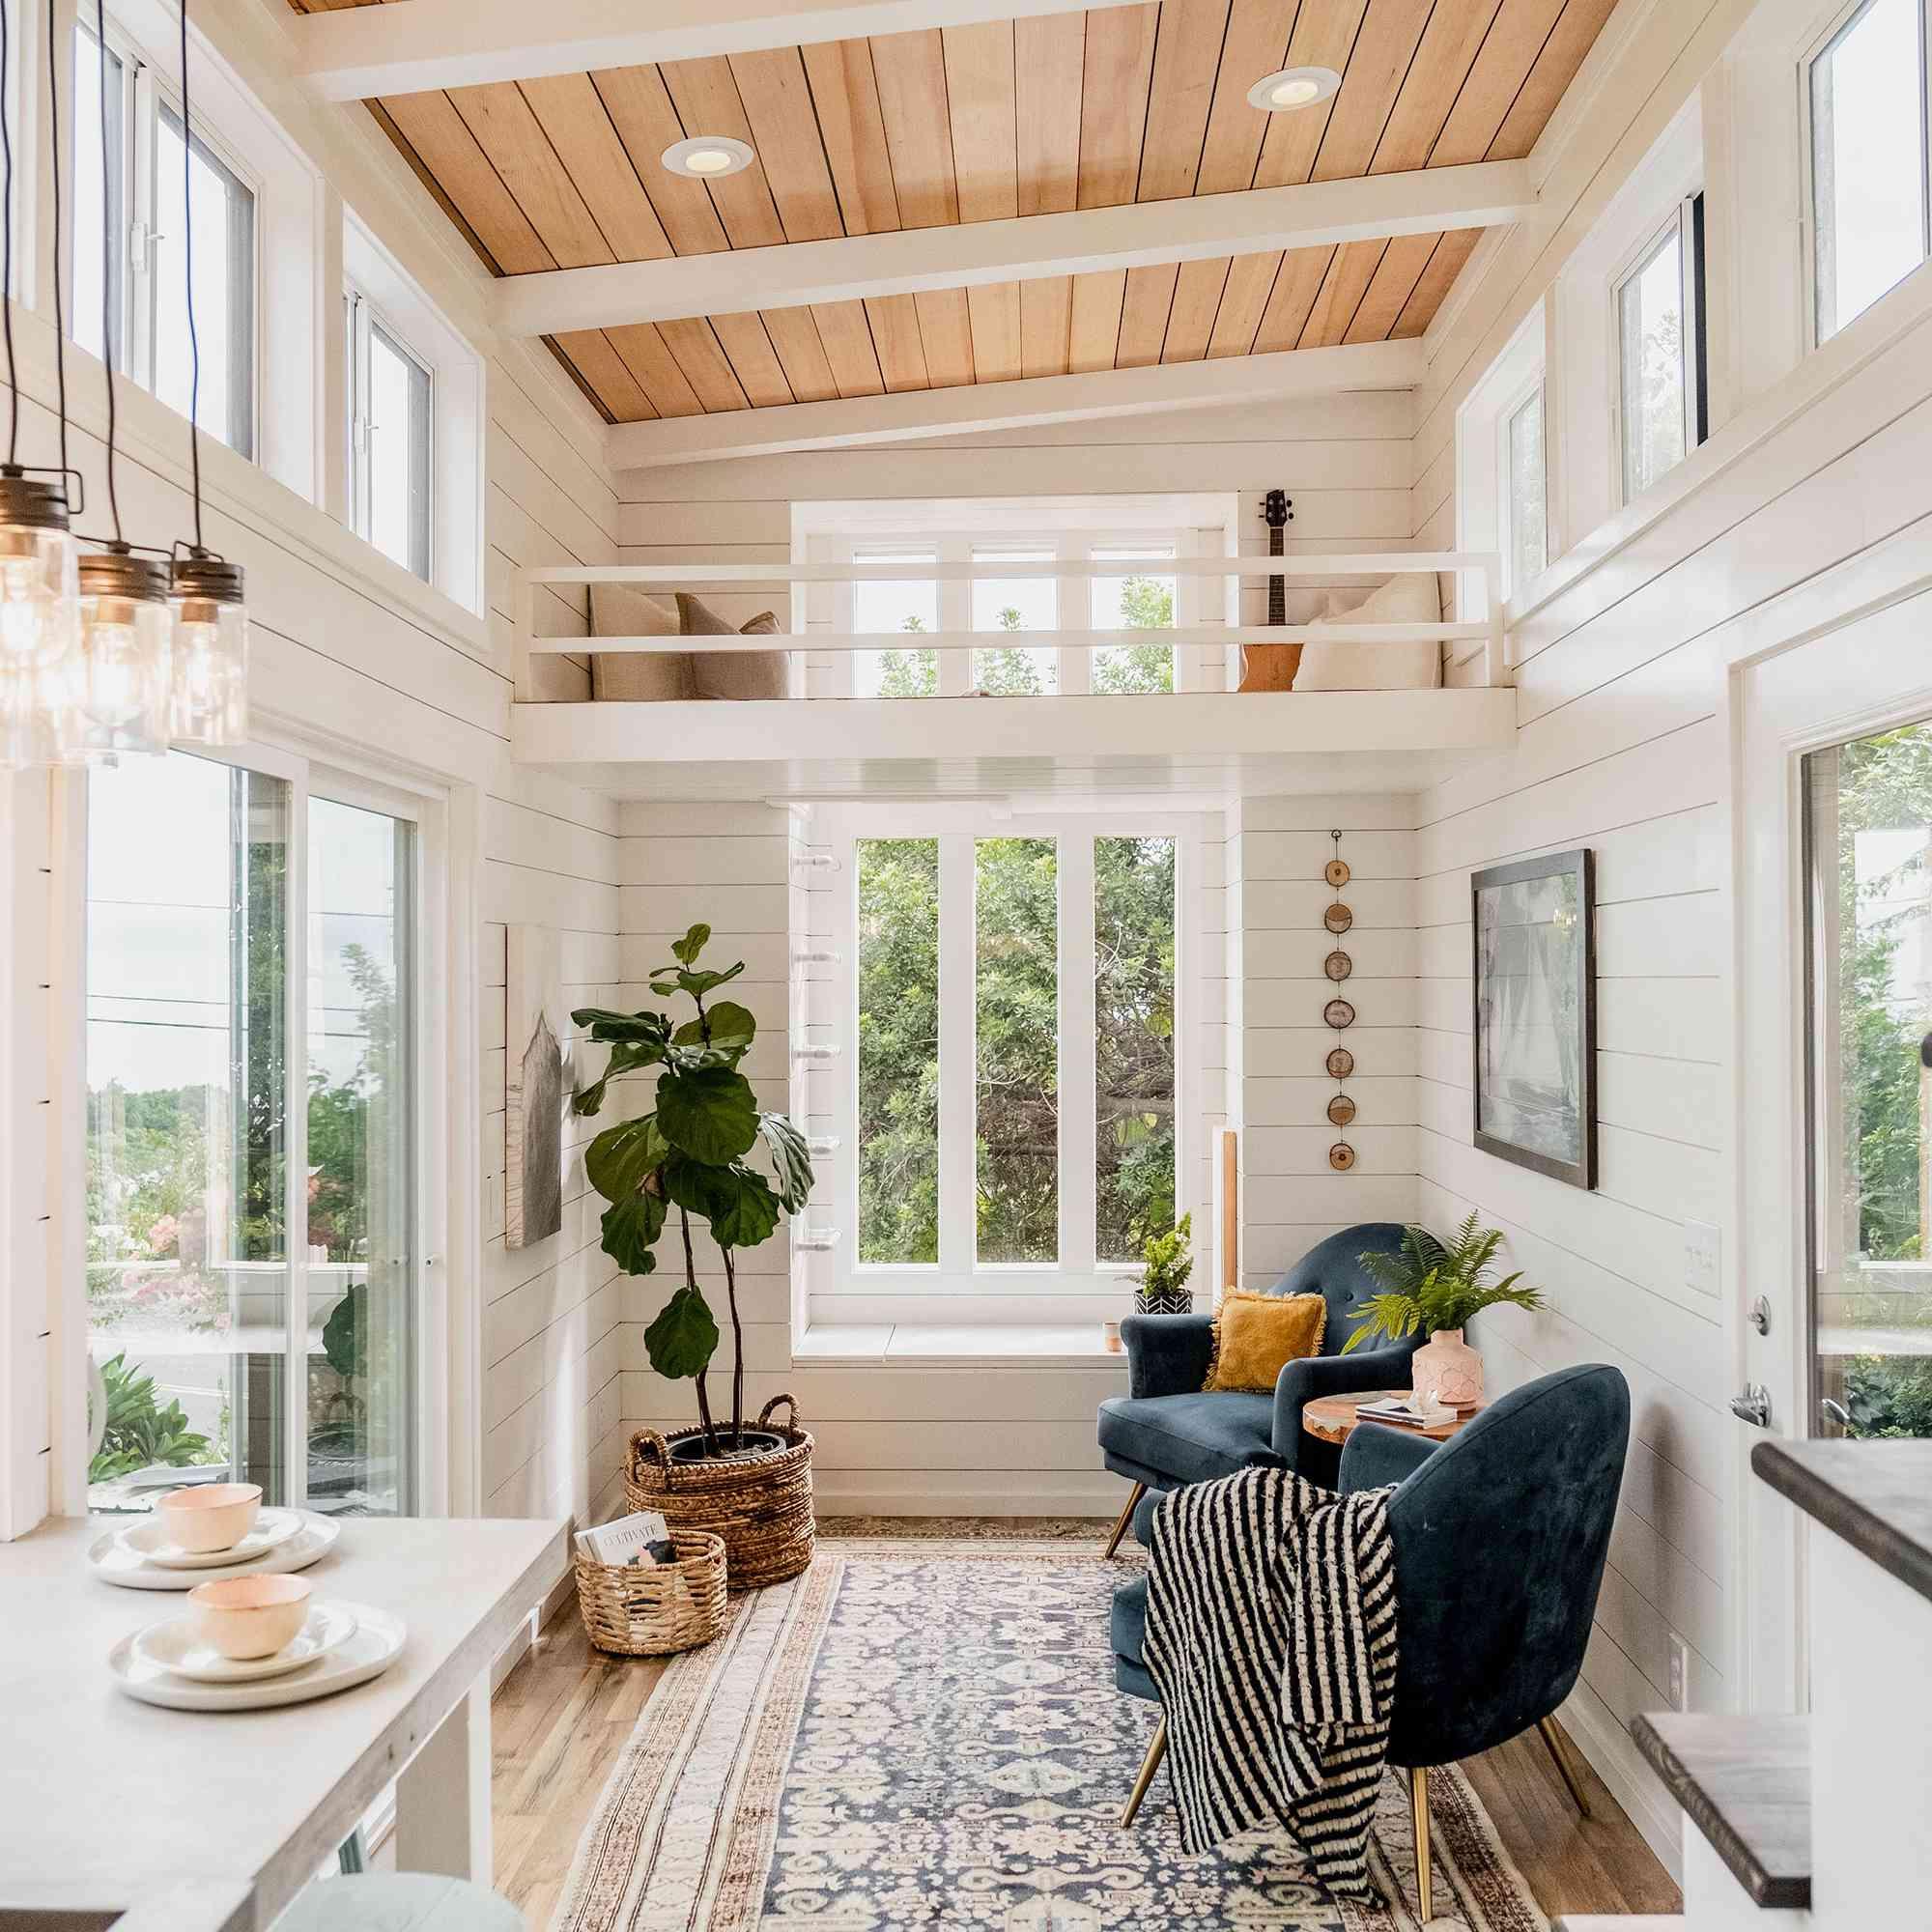 tiny house hawaii Taylor and Michaella McClendon interior main living space